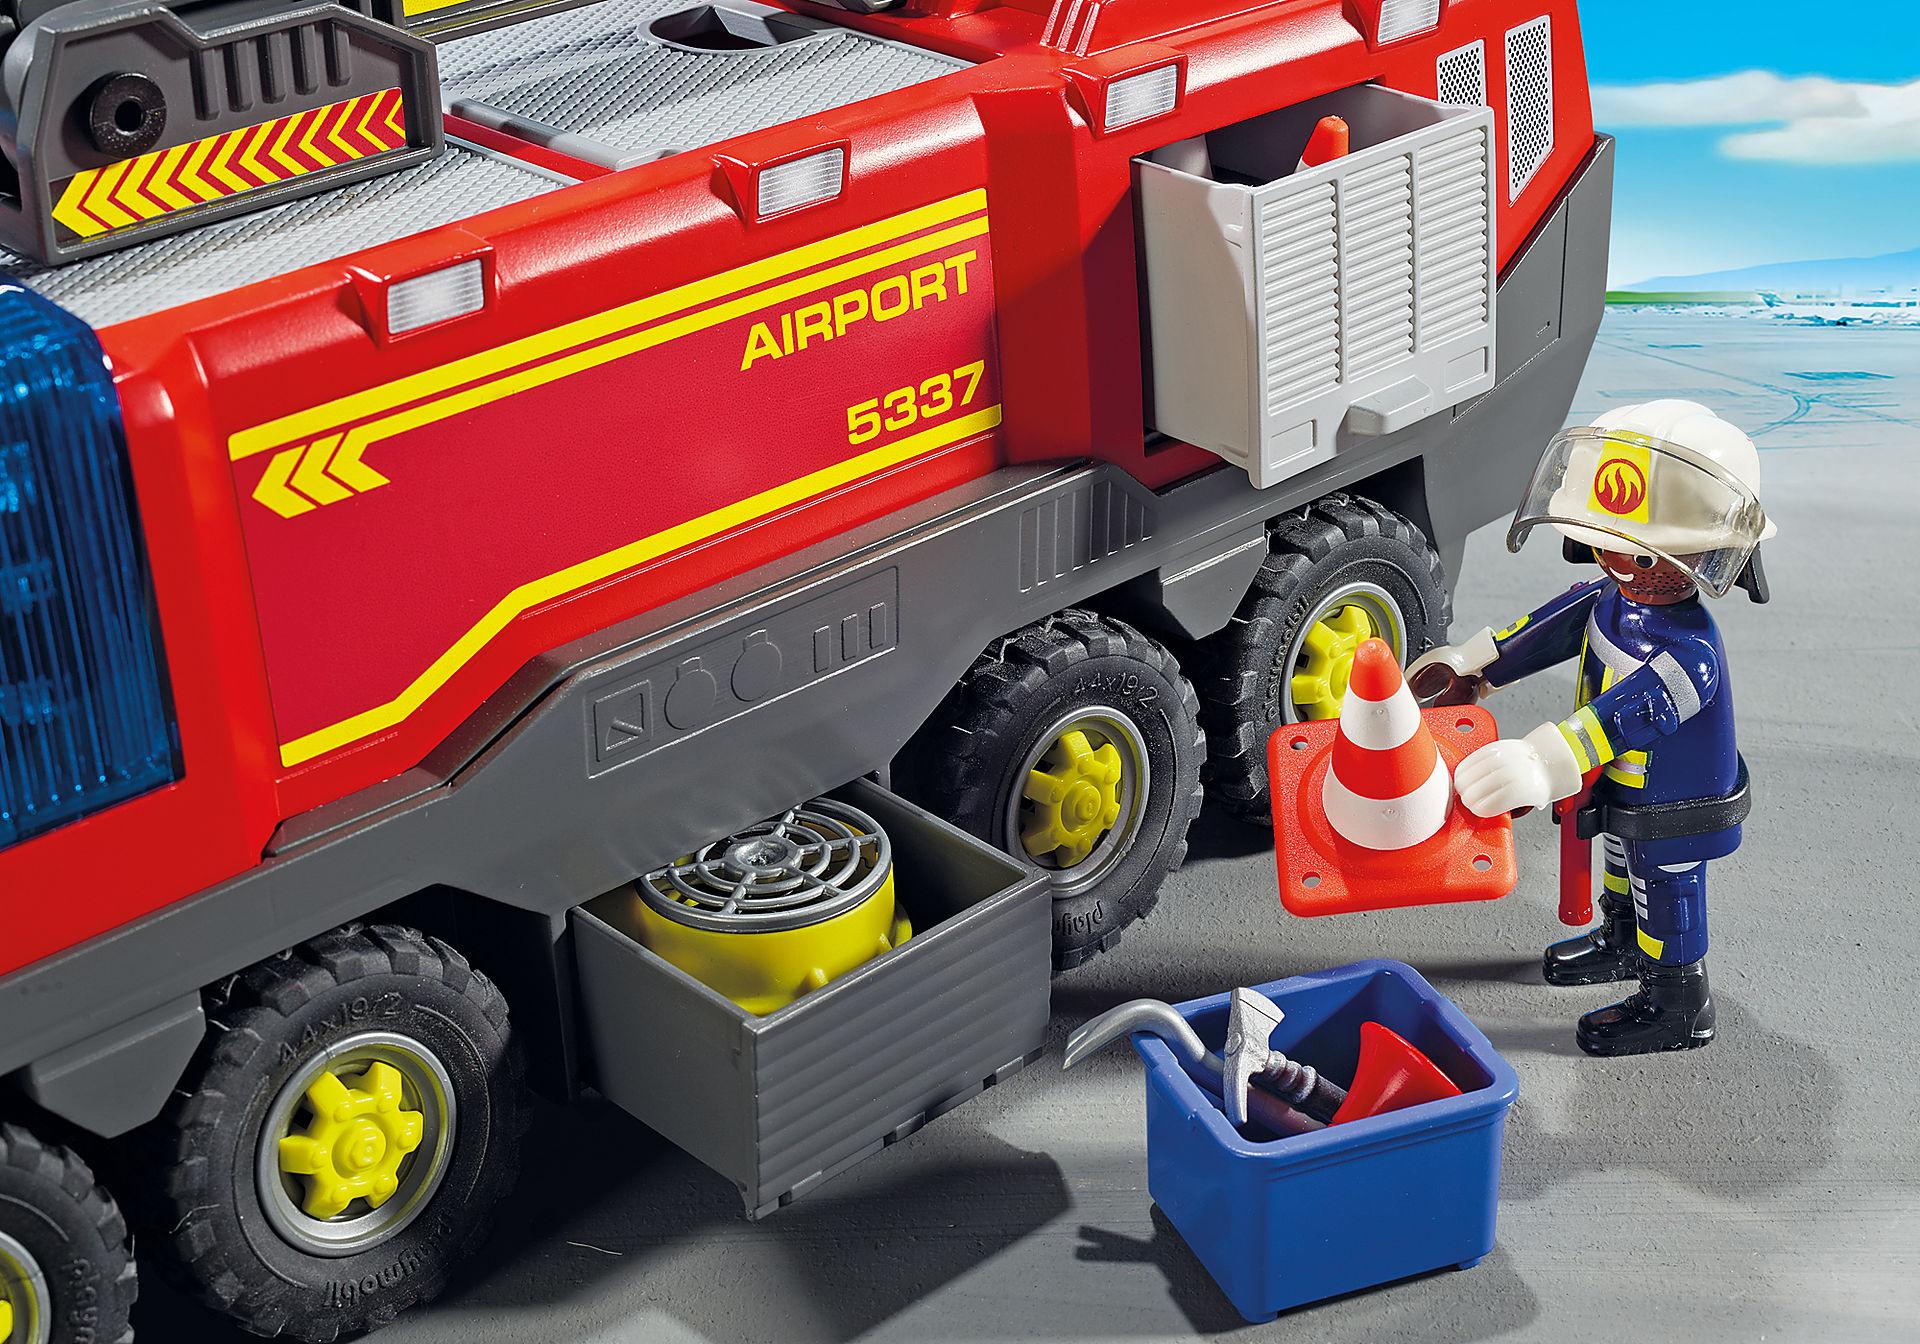 http://media.playmobil.com/i/playmobil/5337_product_extra3/Flughafenlöschfahrzeug mit Licht und Sound